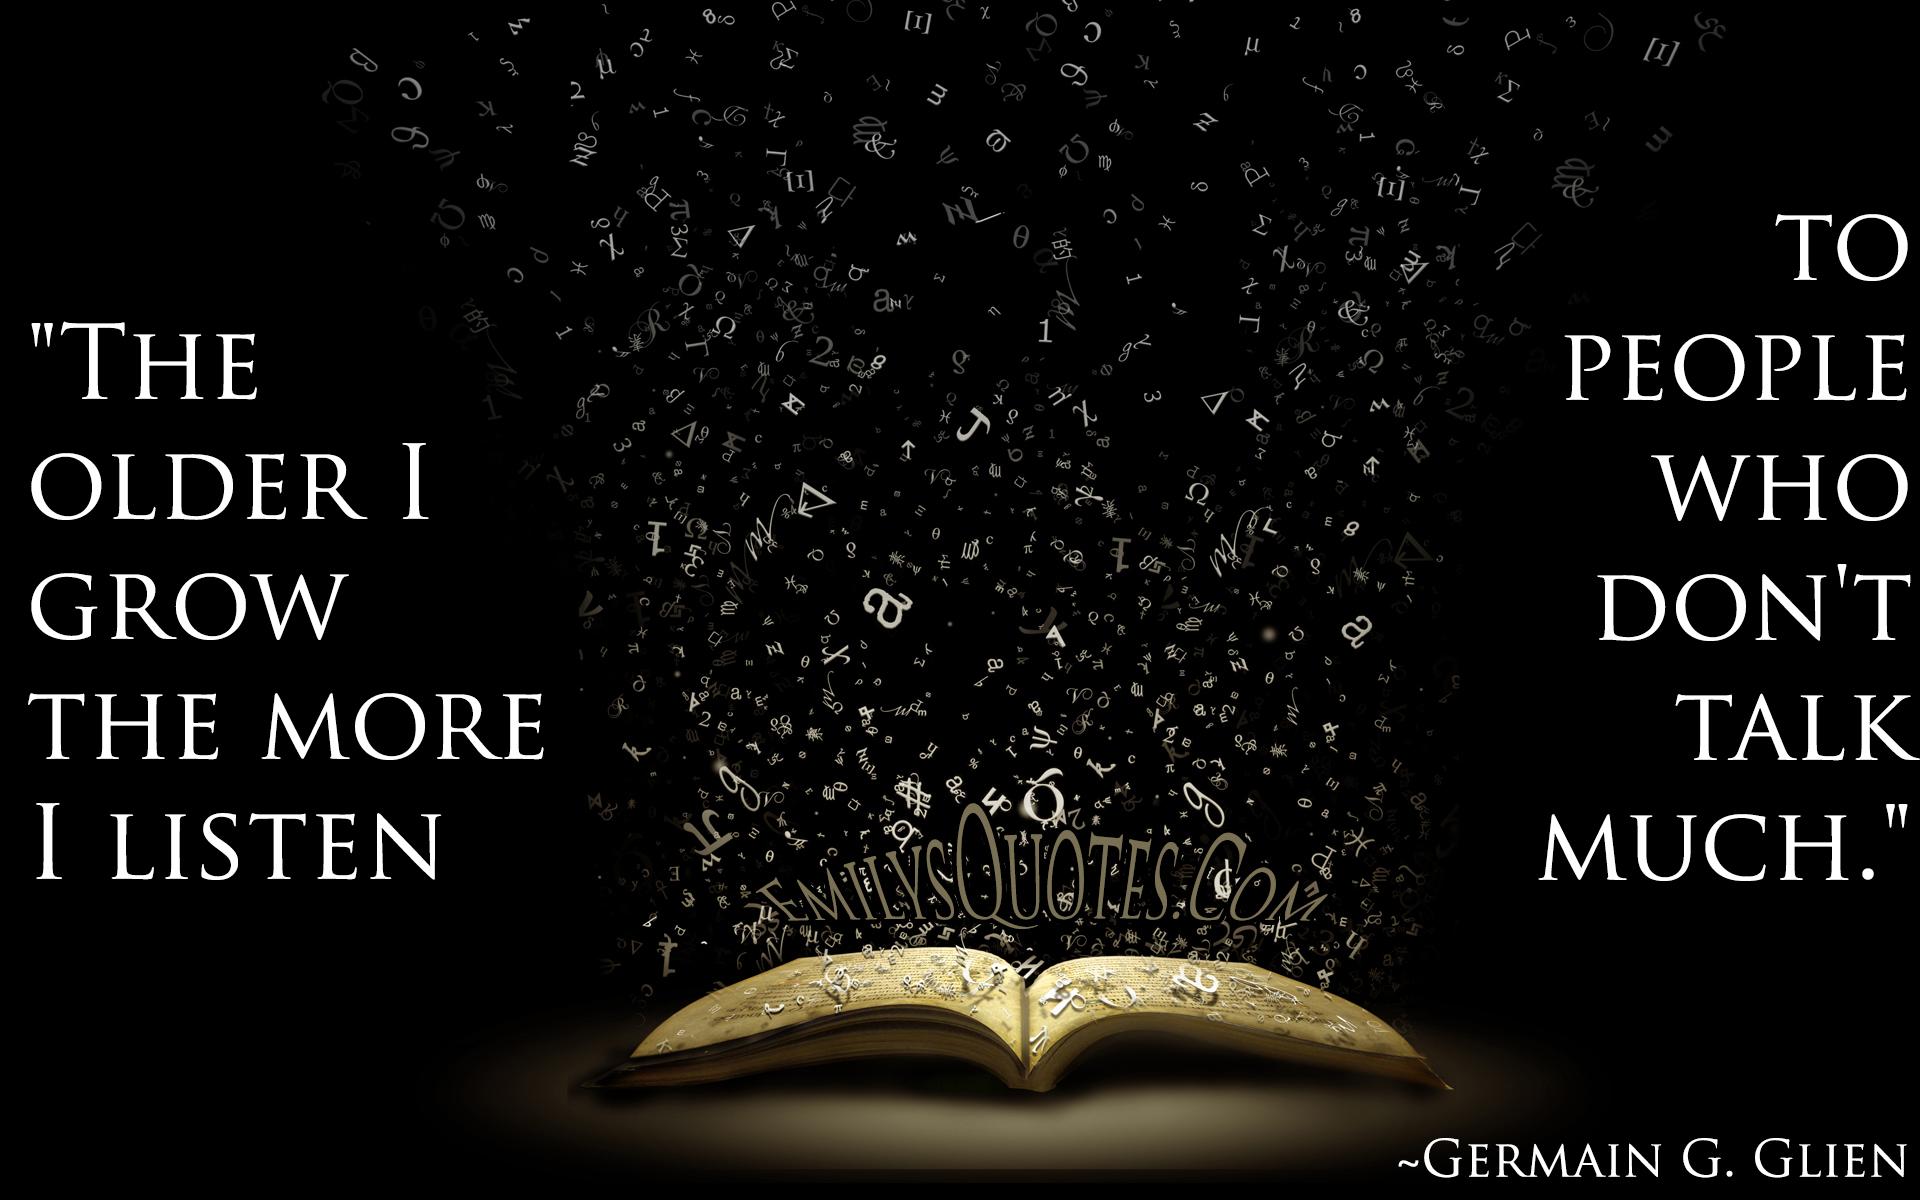 EmilysQuotes.Com - wisdom, intelligence, communication, Germain G. Glien